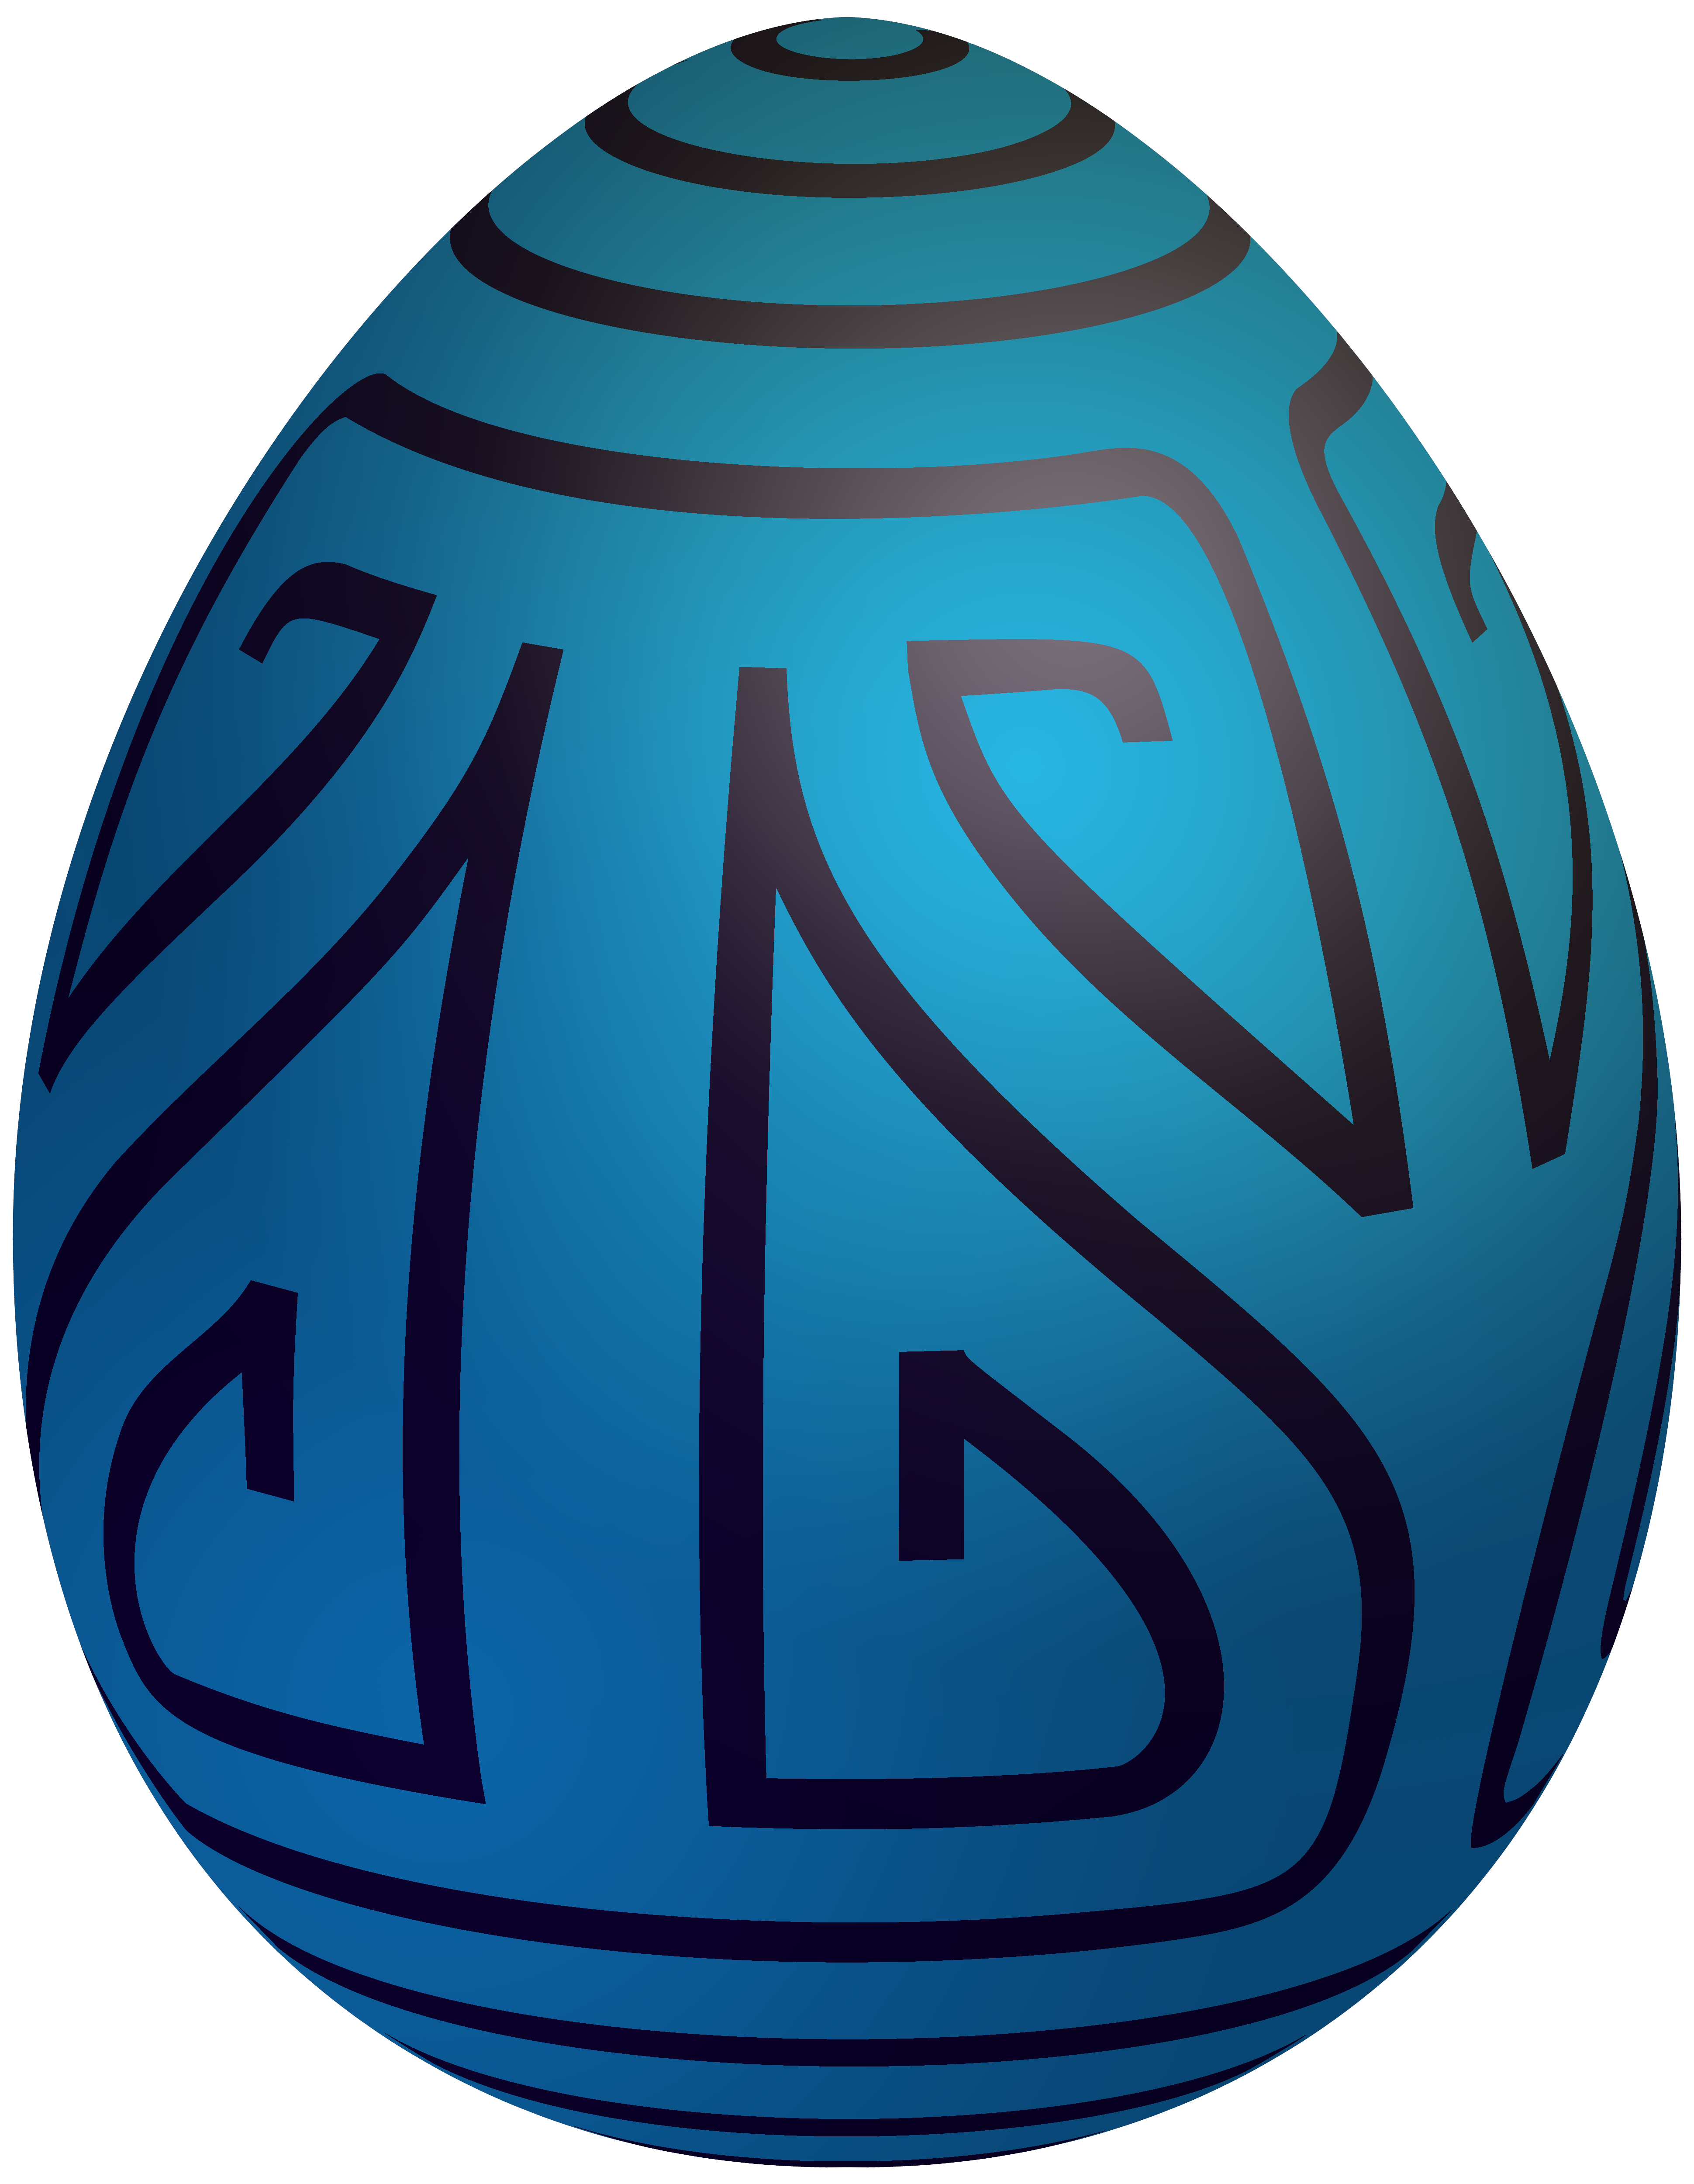 Clipart money easter. Blue decorative egg png